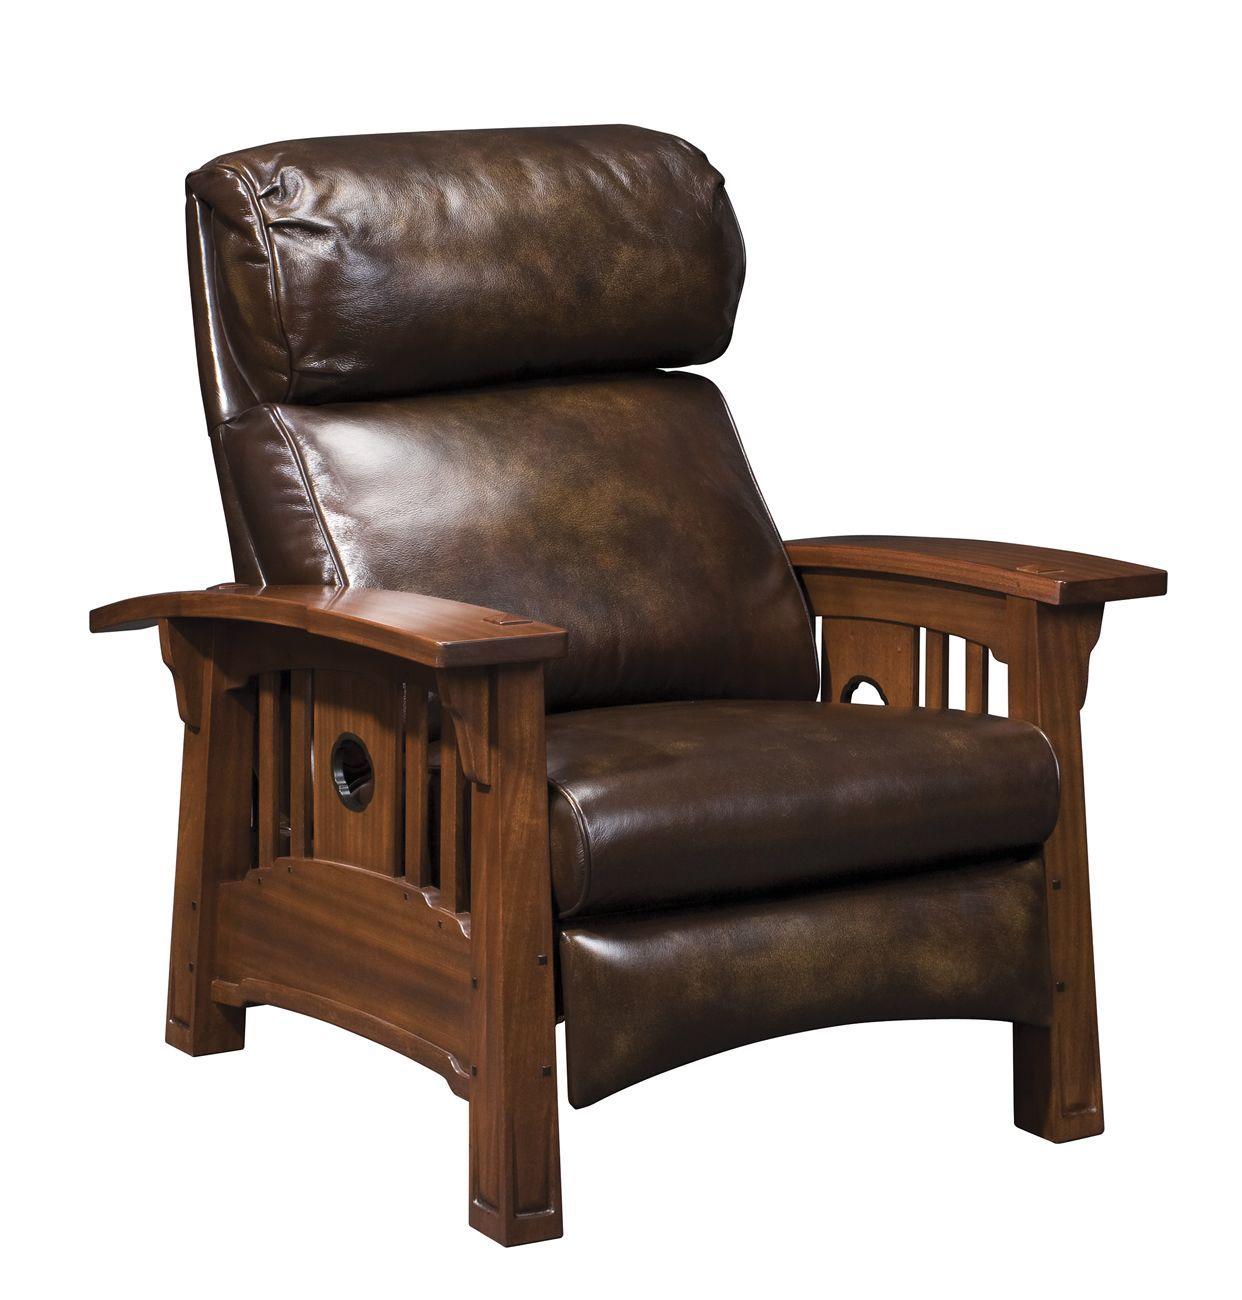 Stickley Furniture Tsuba Bustle Back Recliner